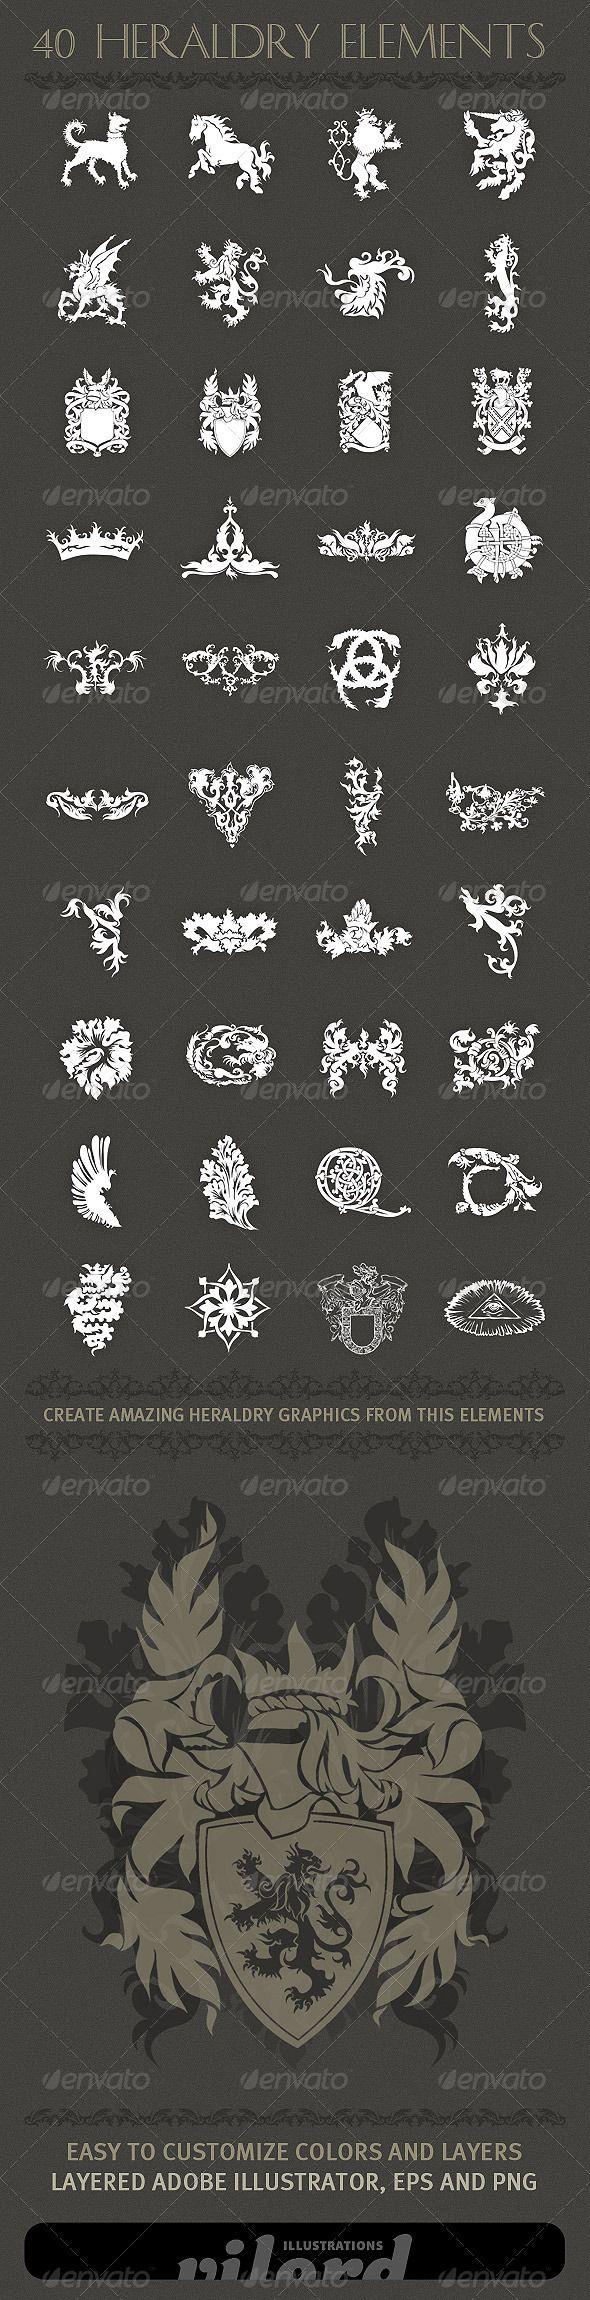 40 Heraldry Crest Elements